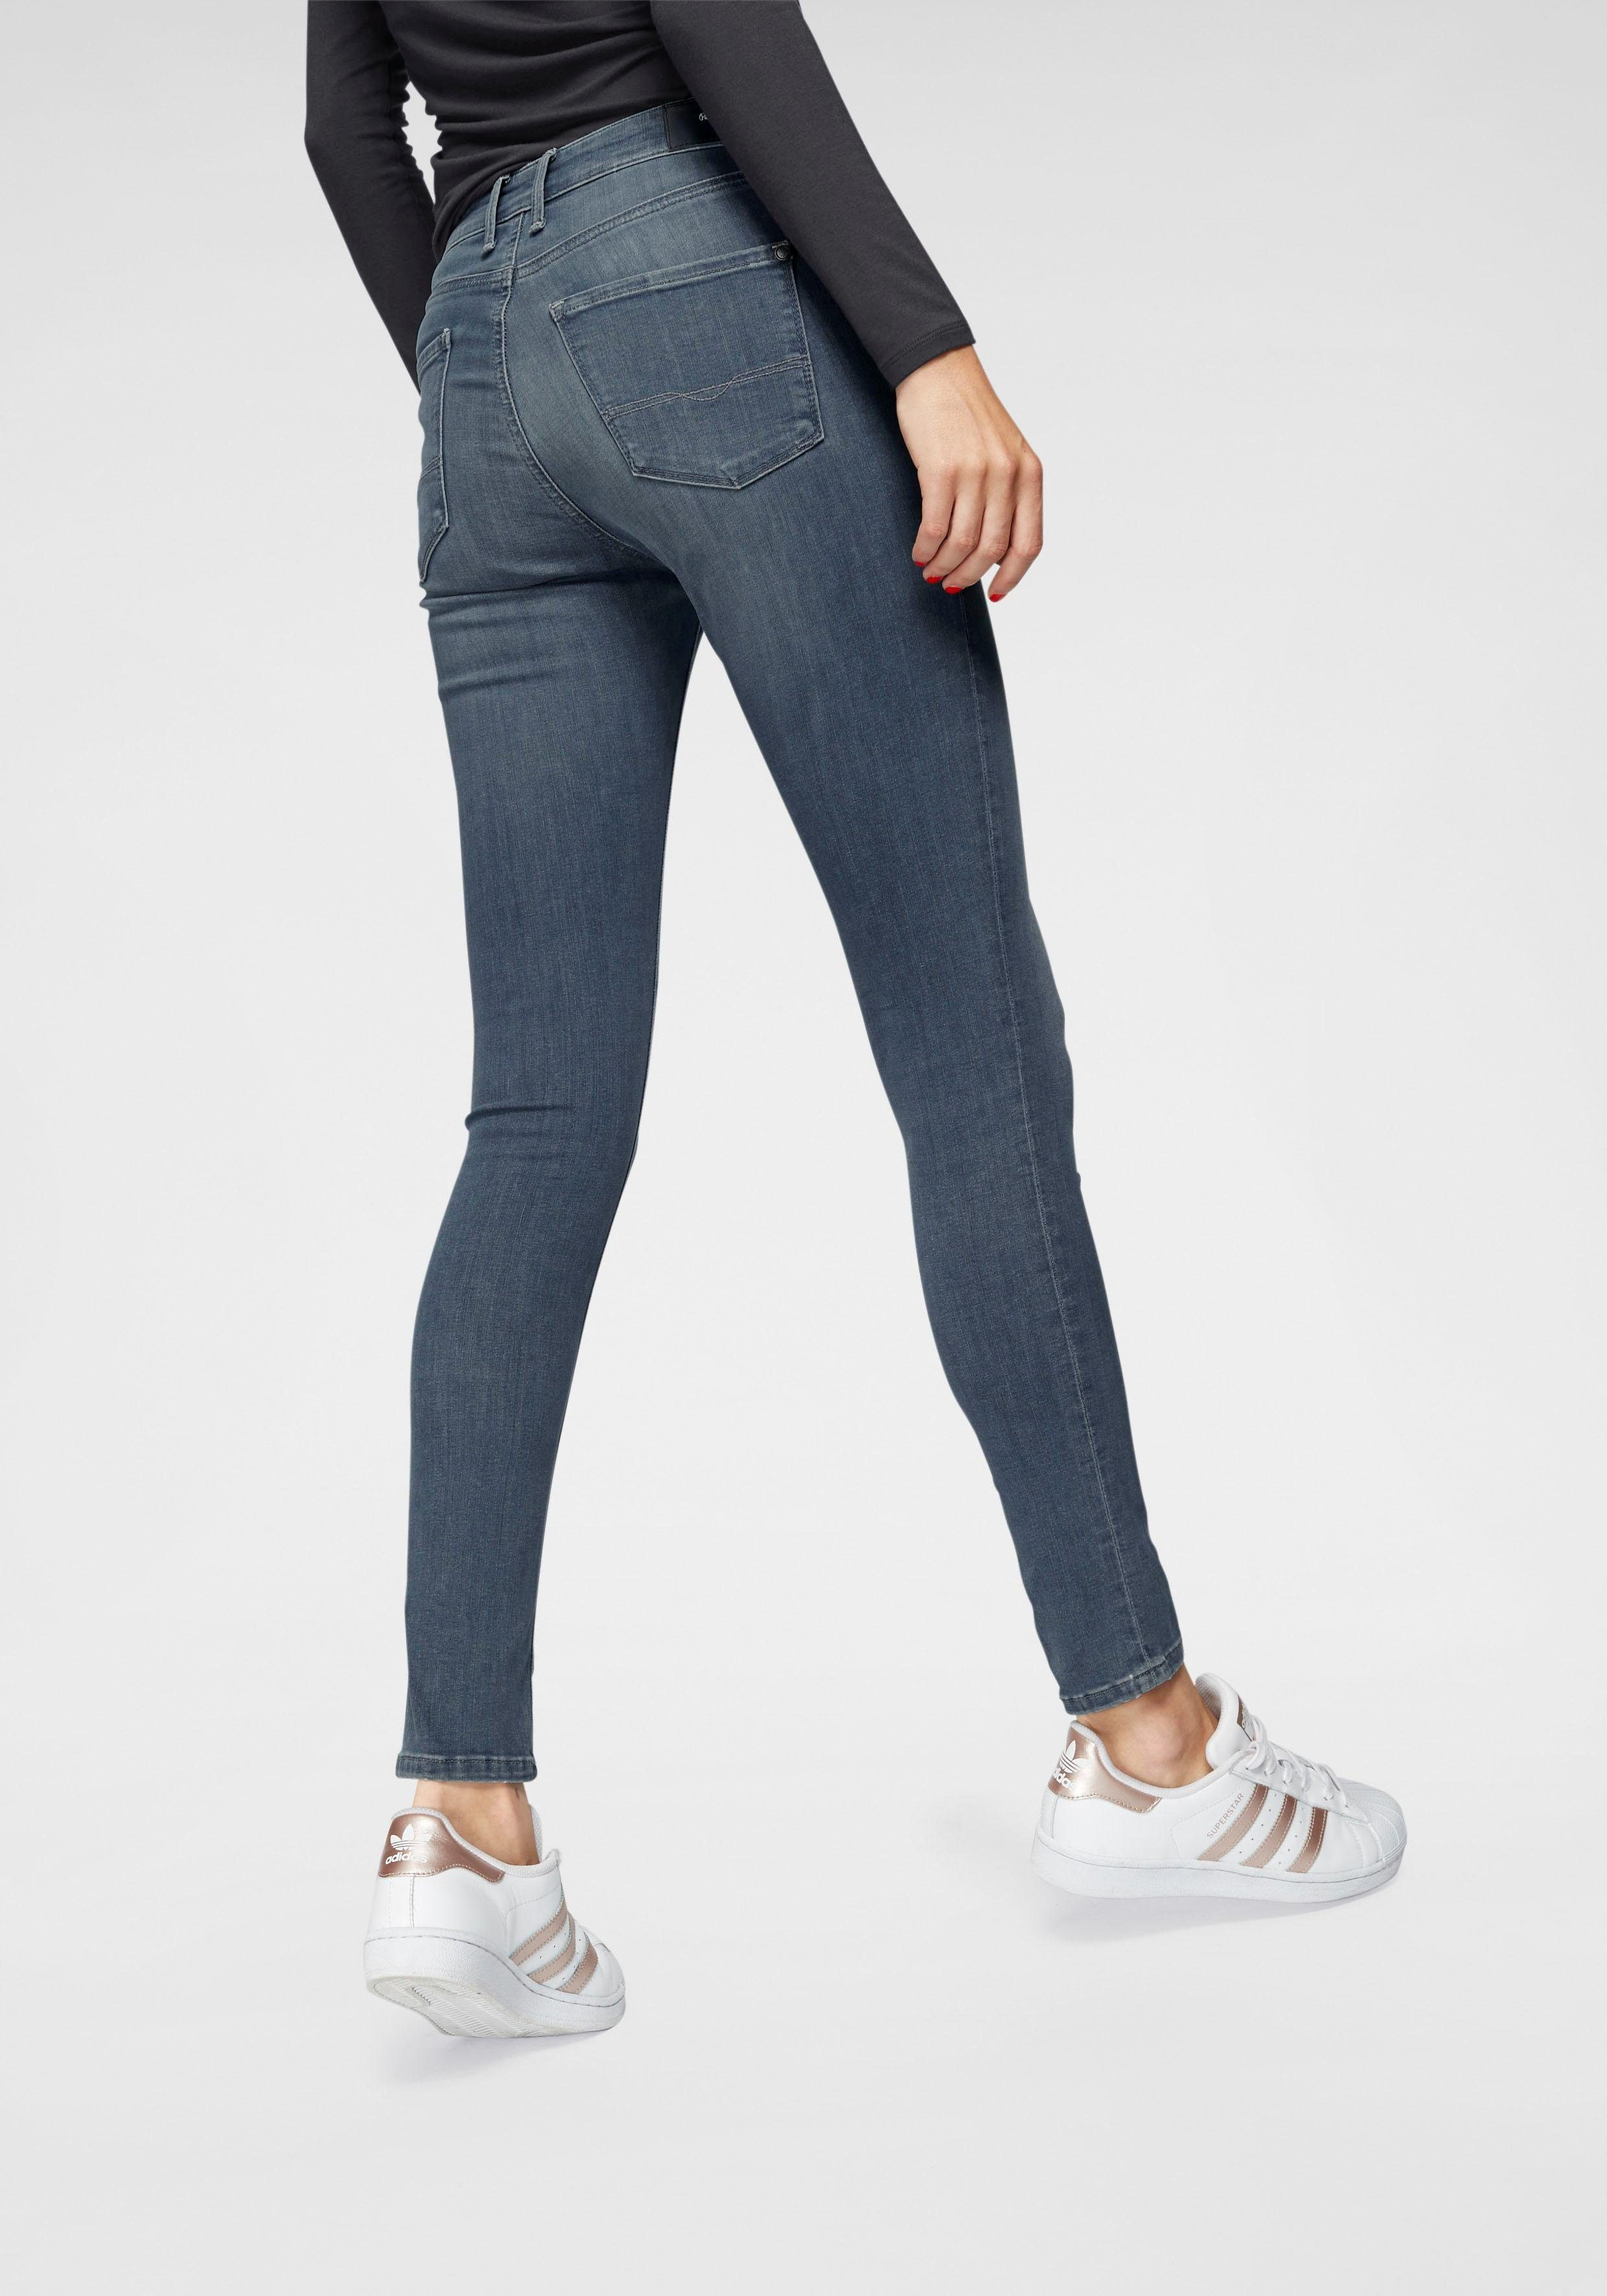 Pepe Jeans Skinny fit Jeans »REGENT« POWERFLEX mit High Waisted online kaufen   OTTO